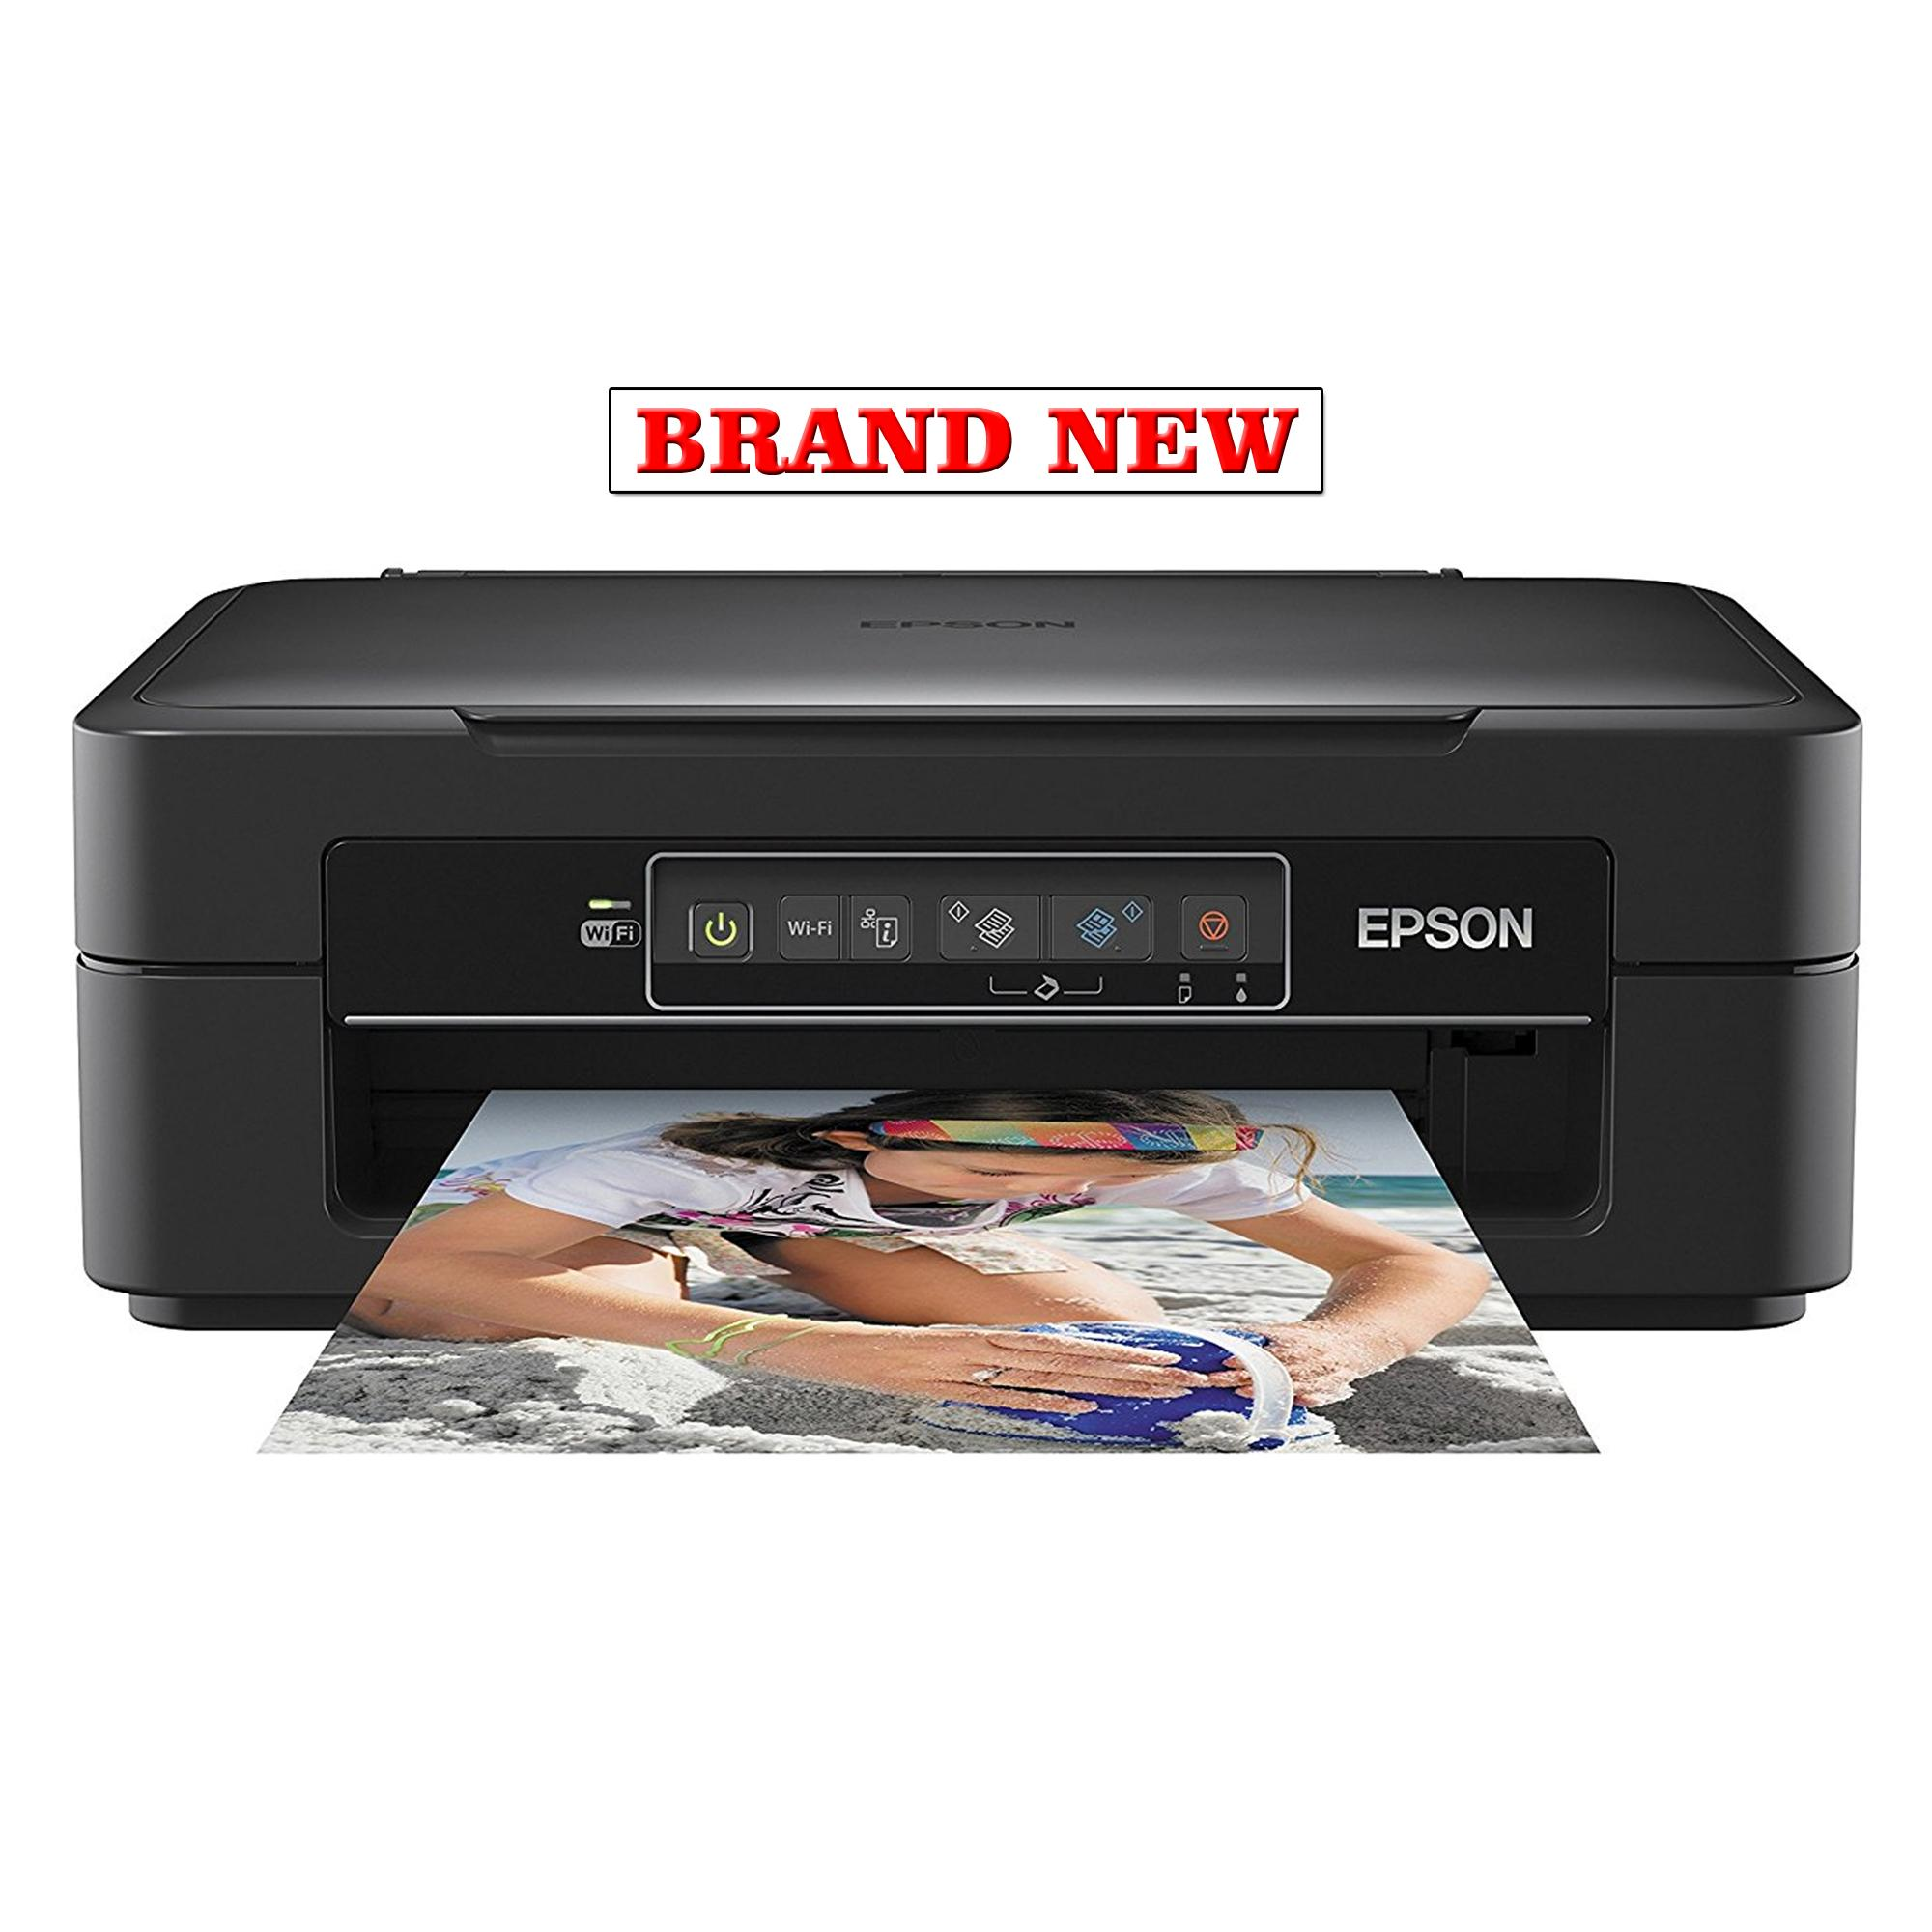 Epson Philippines Printers For Sale Prices Reviews Lazada Tinta L100 L110 L200 L210 L220 L300 L310  Per Set Expression Home Xp 235 Print Scan Copy Wi Fi Color